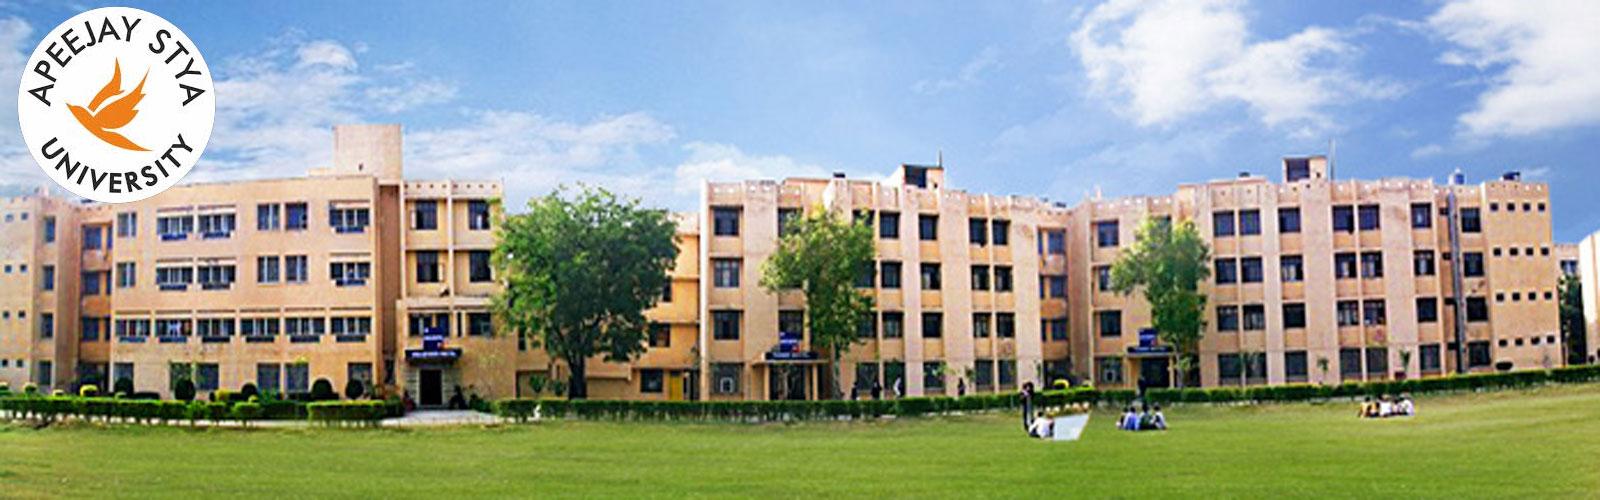 asu university